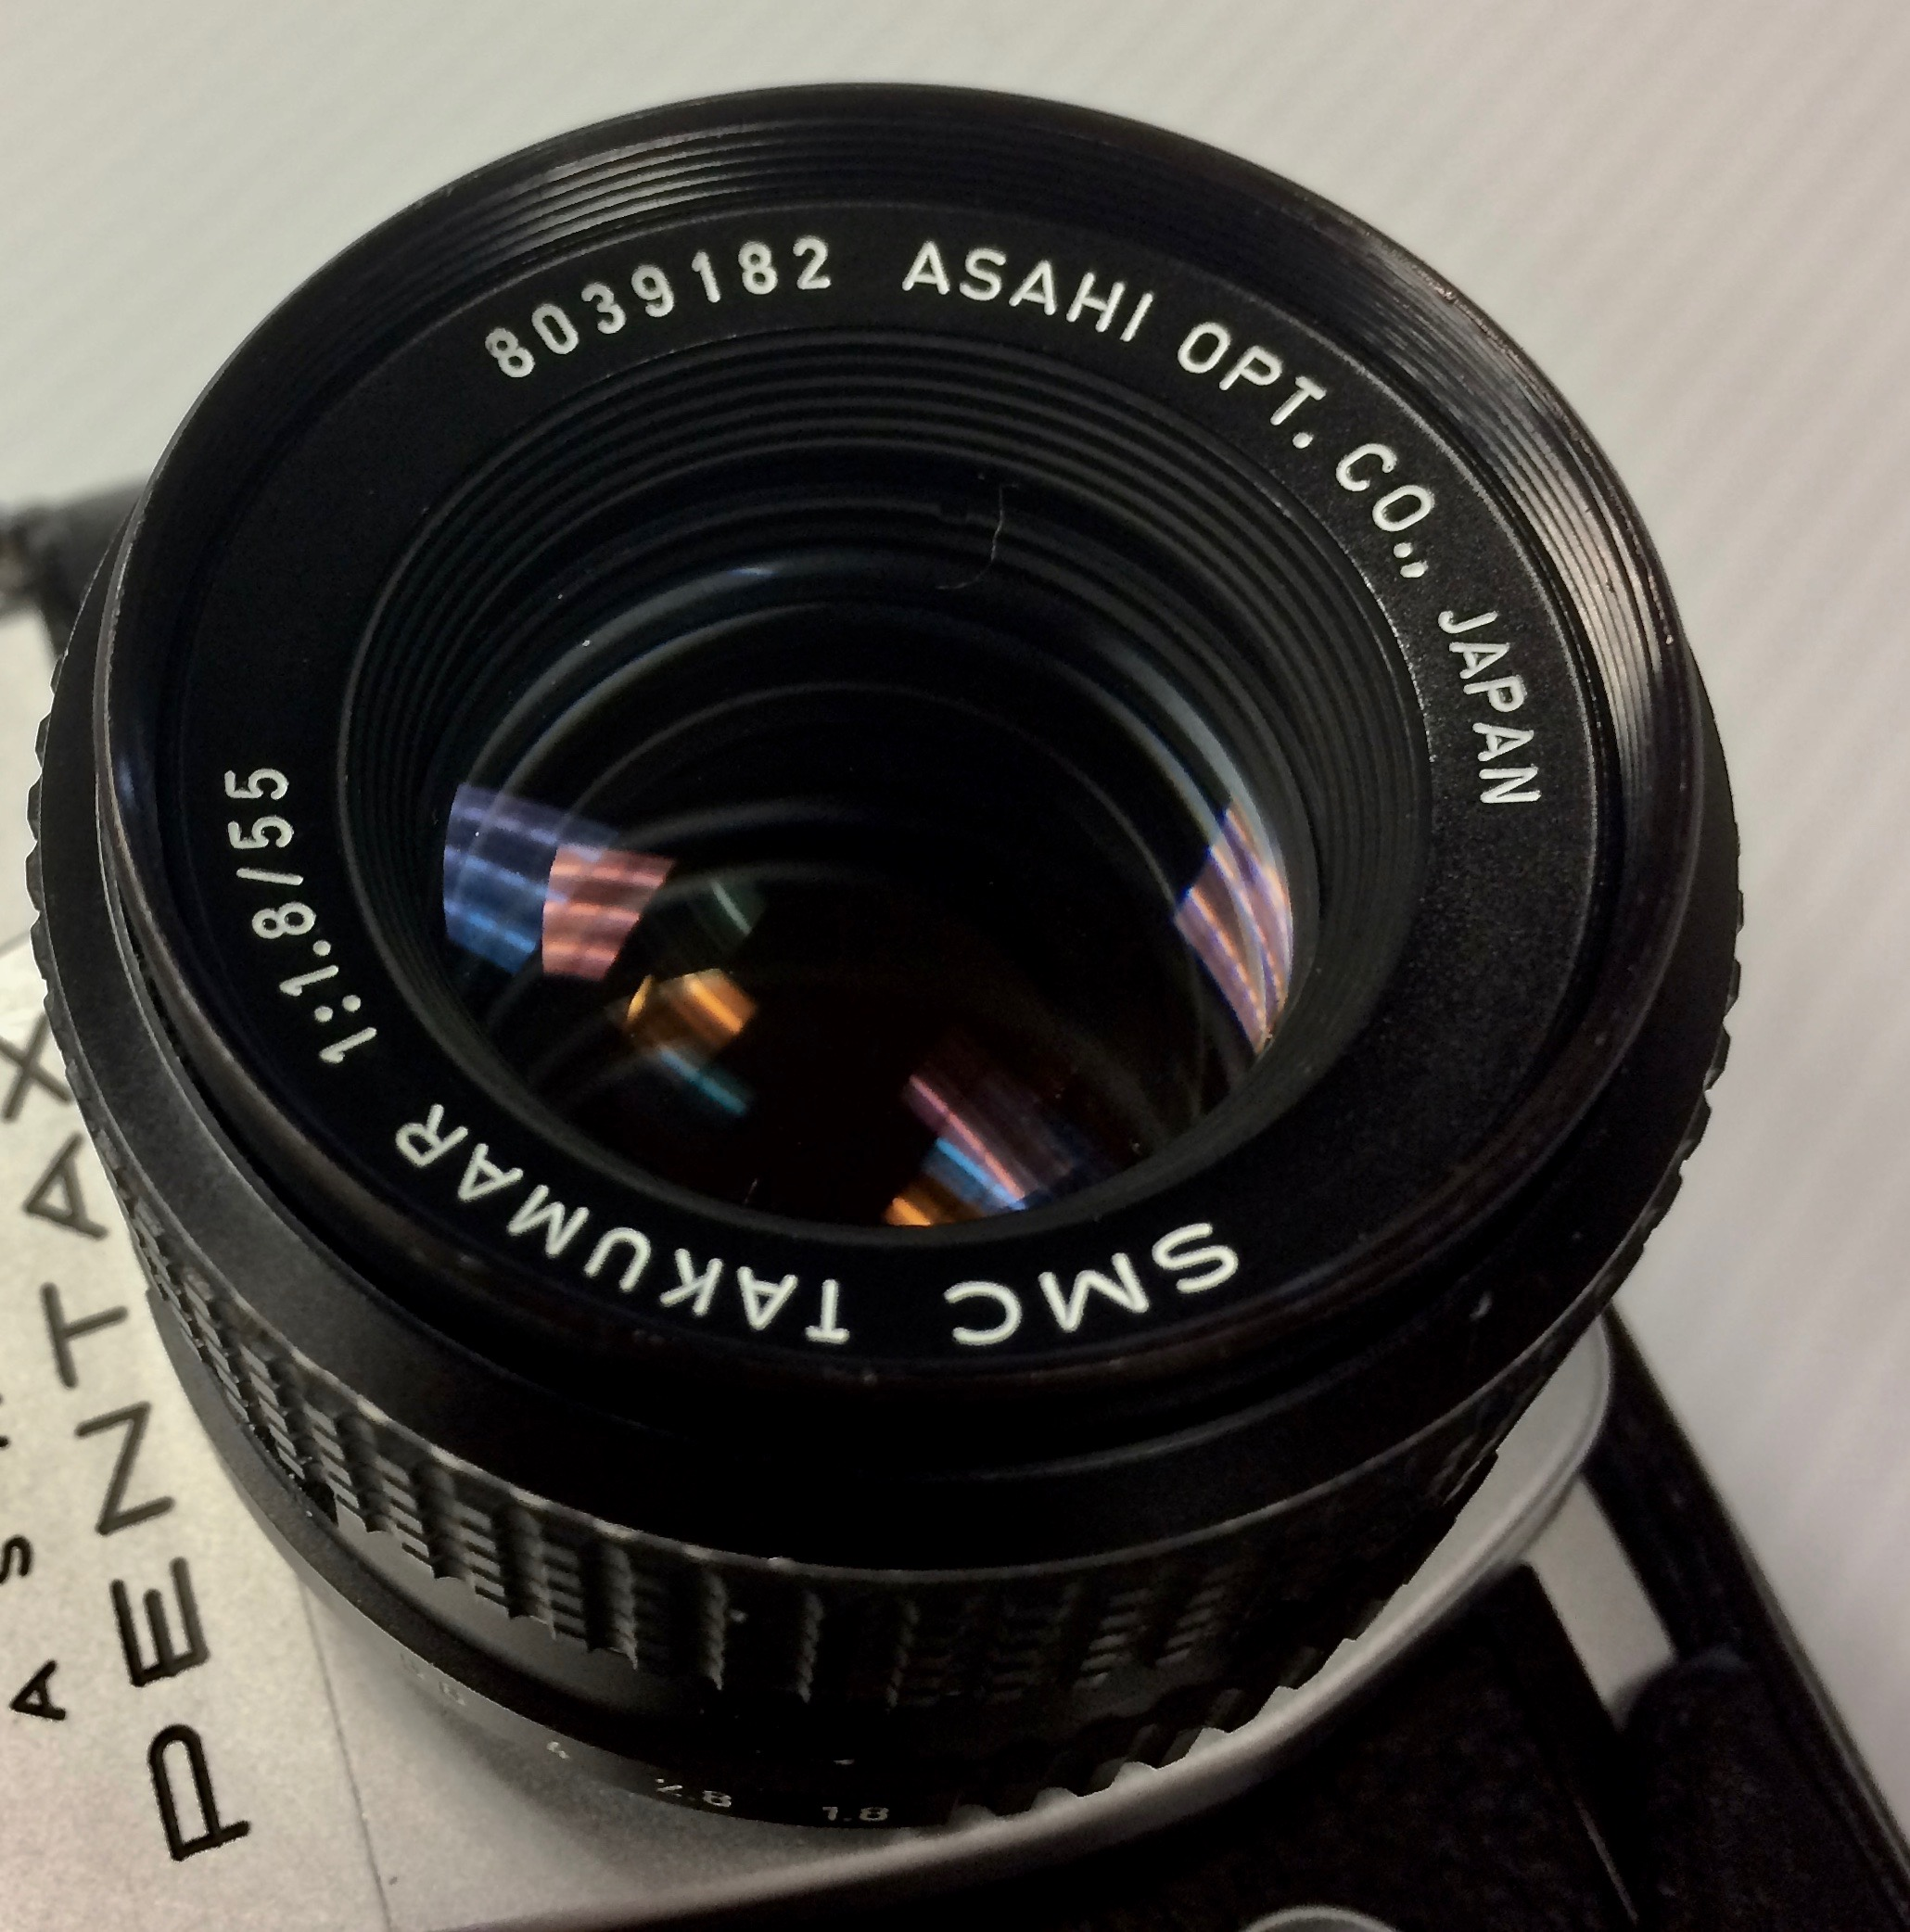 Lens serial number